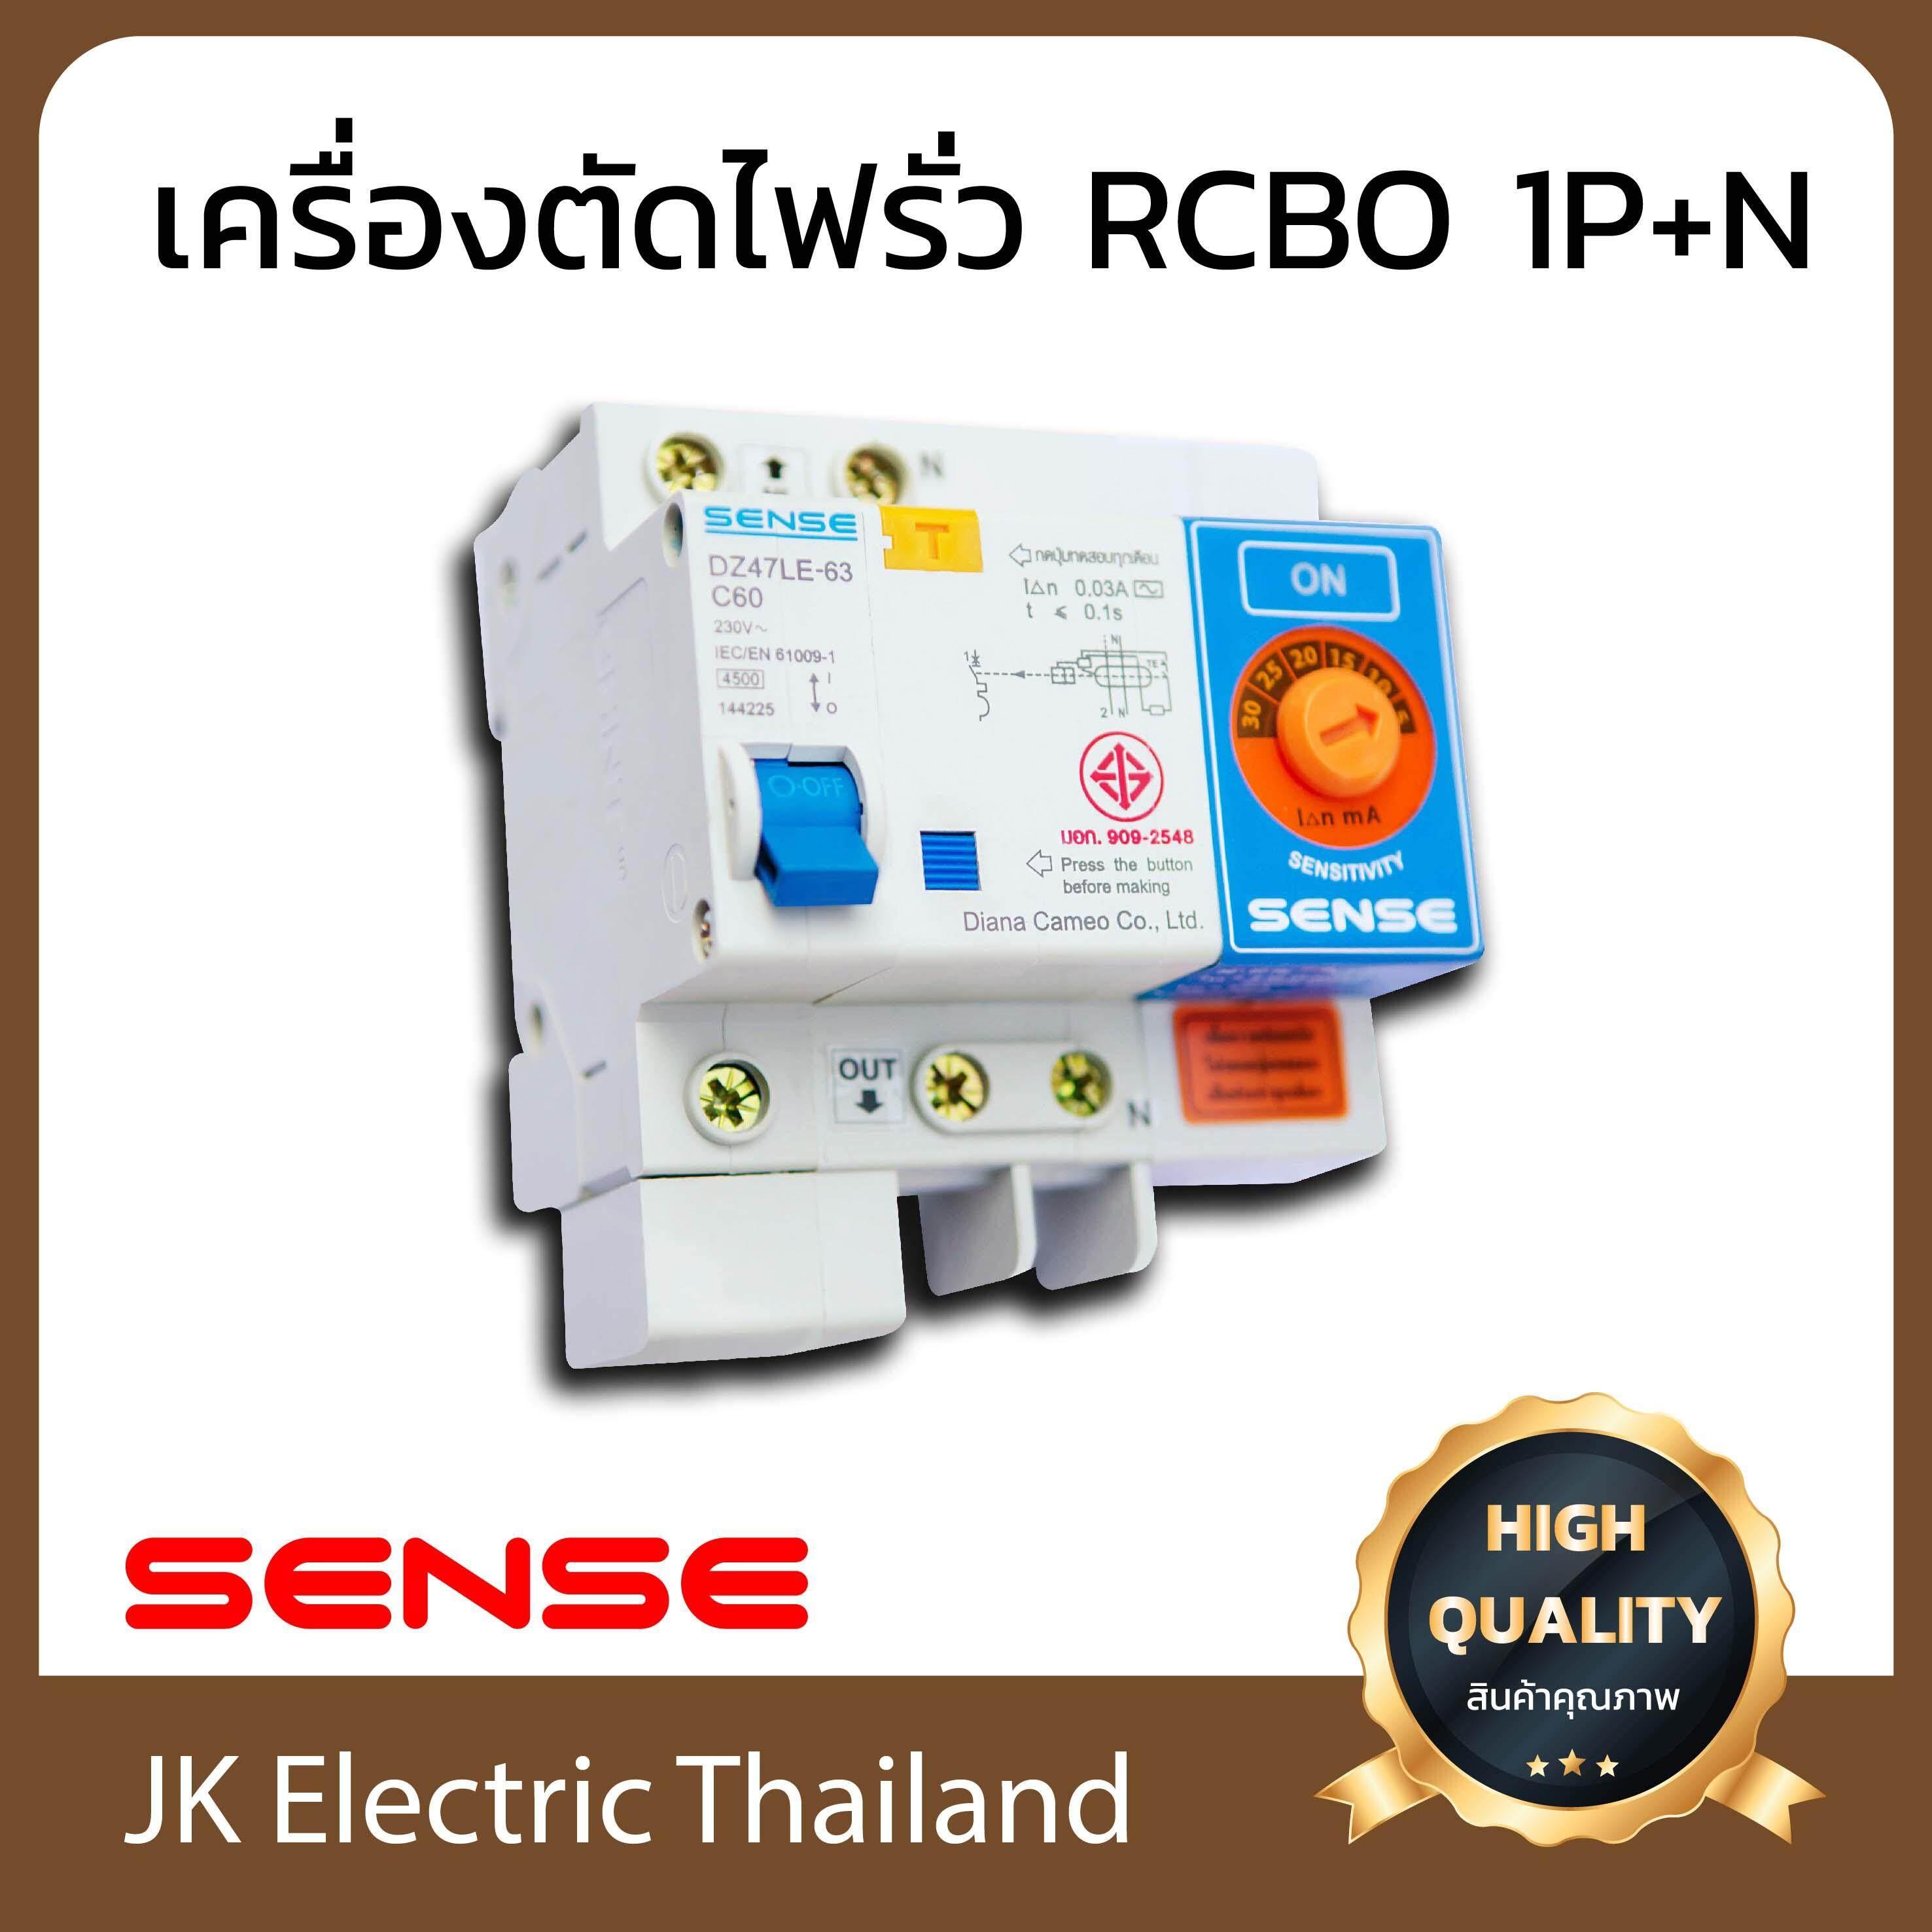 Sense กันดูด เครื่องตัดไฟ เครื่องตัดไฟรั่ว (RCD) เซนส์ ชนิด RCBO 1P+N 6kA รุ่น DZ47LE-63 (เลือกขนาด 50A, 60A ตามต้องการ) ป้องกันไฟดูด ไฟรั่ว ไฟช็อต ใช้ไฟเกิน